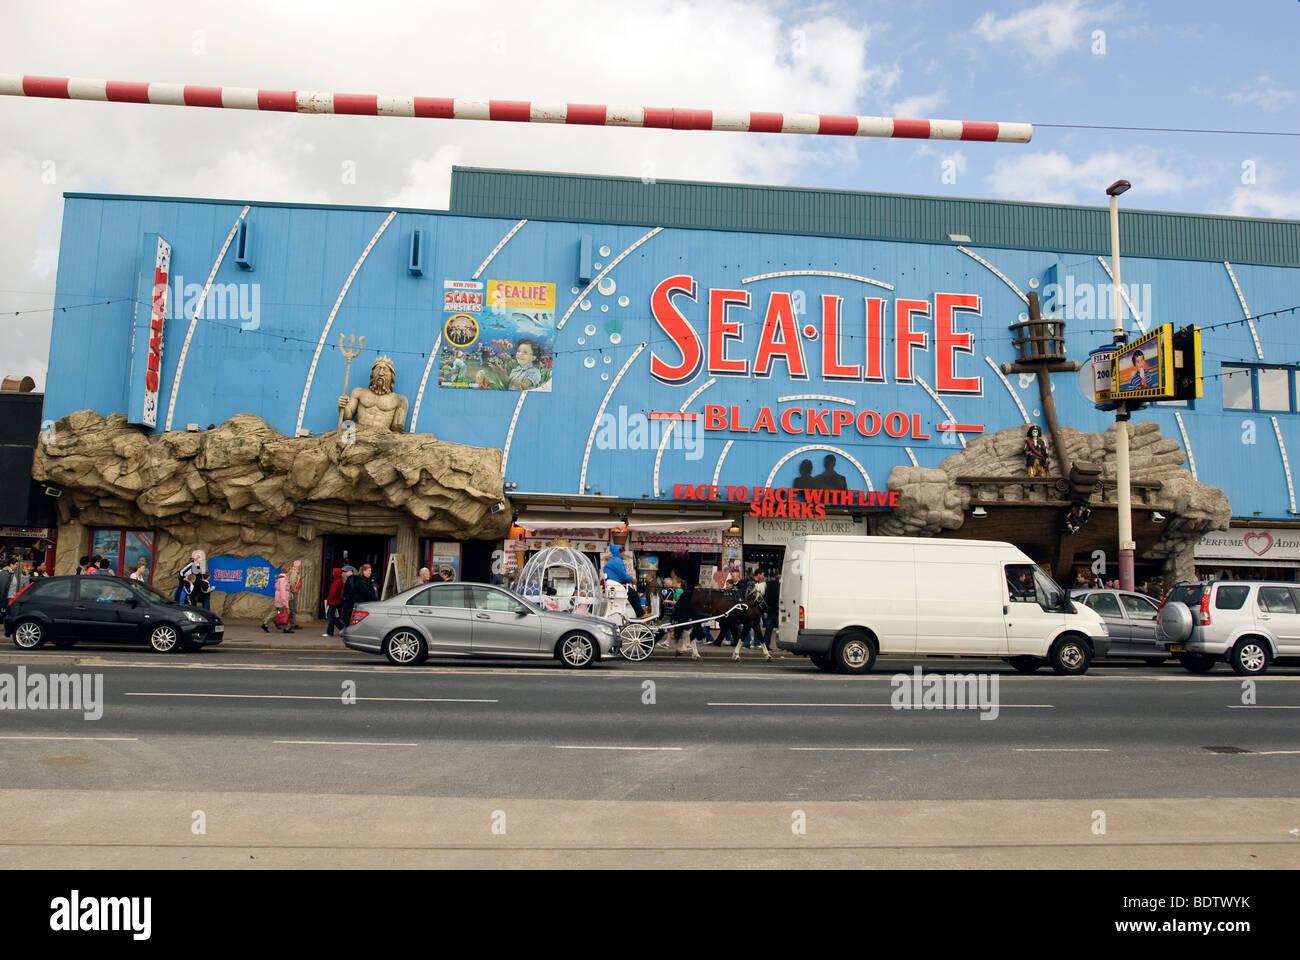 Sealife aquarium on the Blackpool Golden Mile seafront. - Stock Image